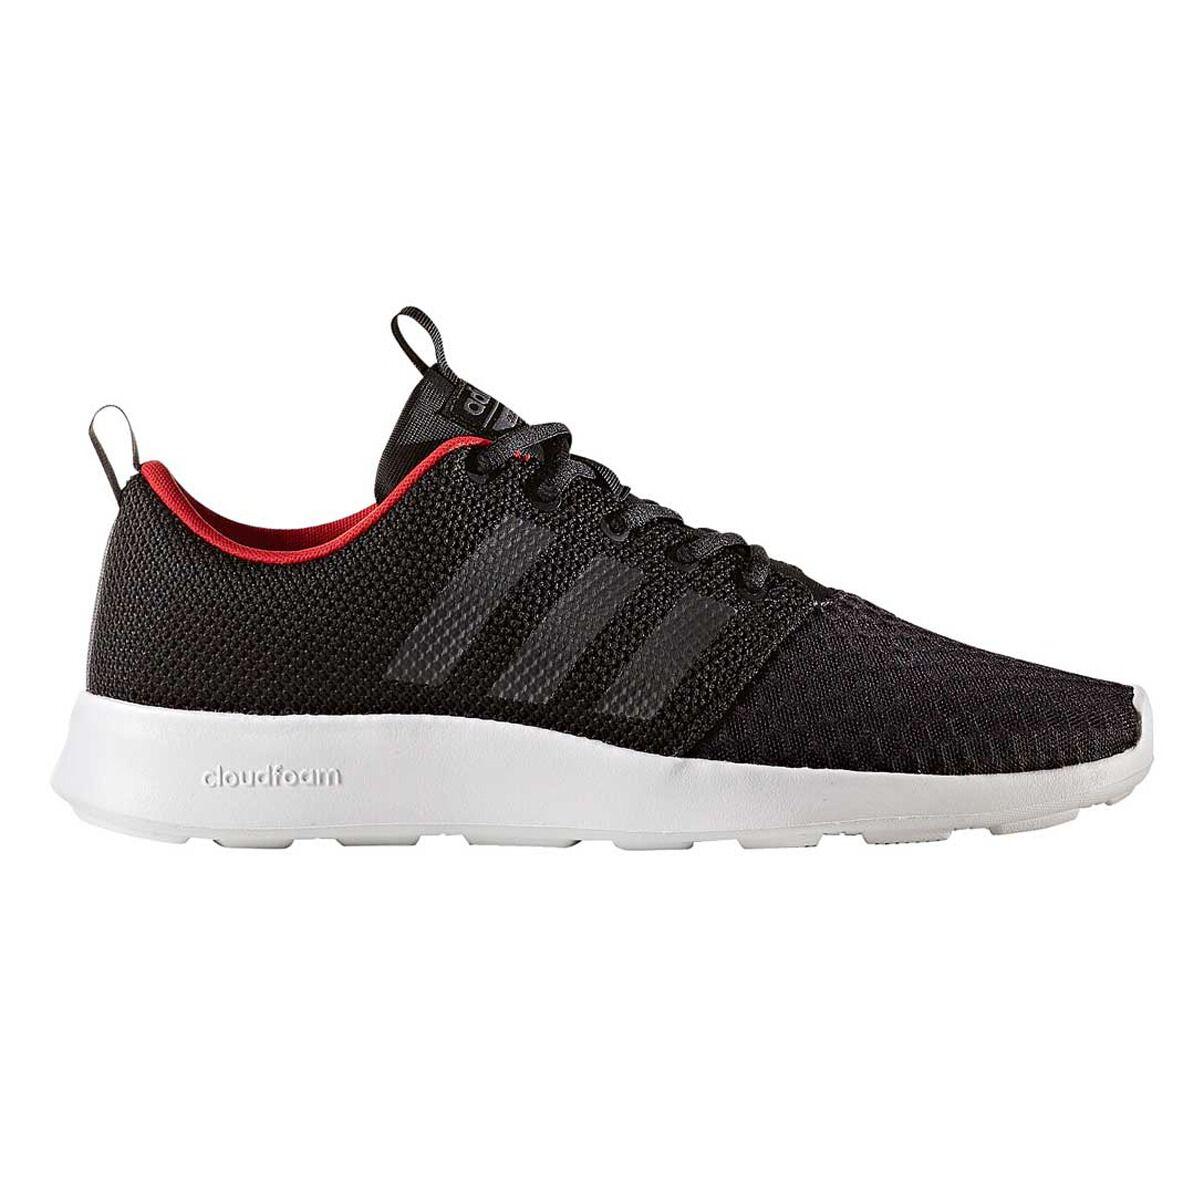 adidas cloudfoam schnelle racer mens casual schuhen schwarz / graue uns 12